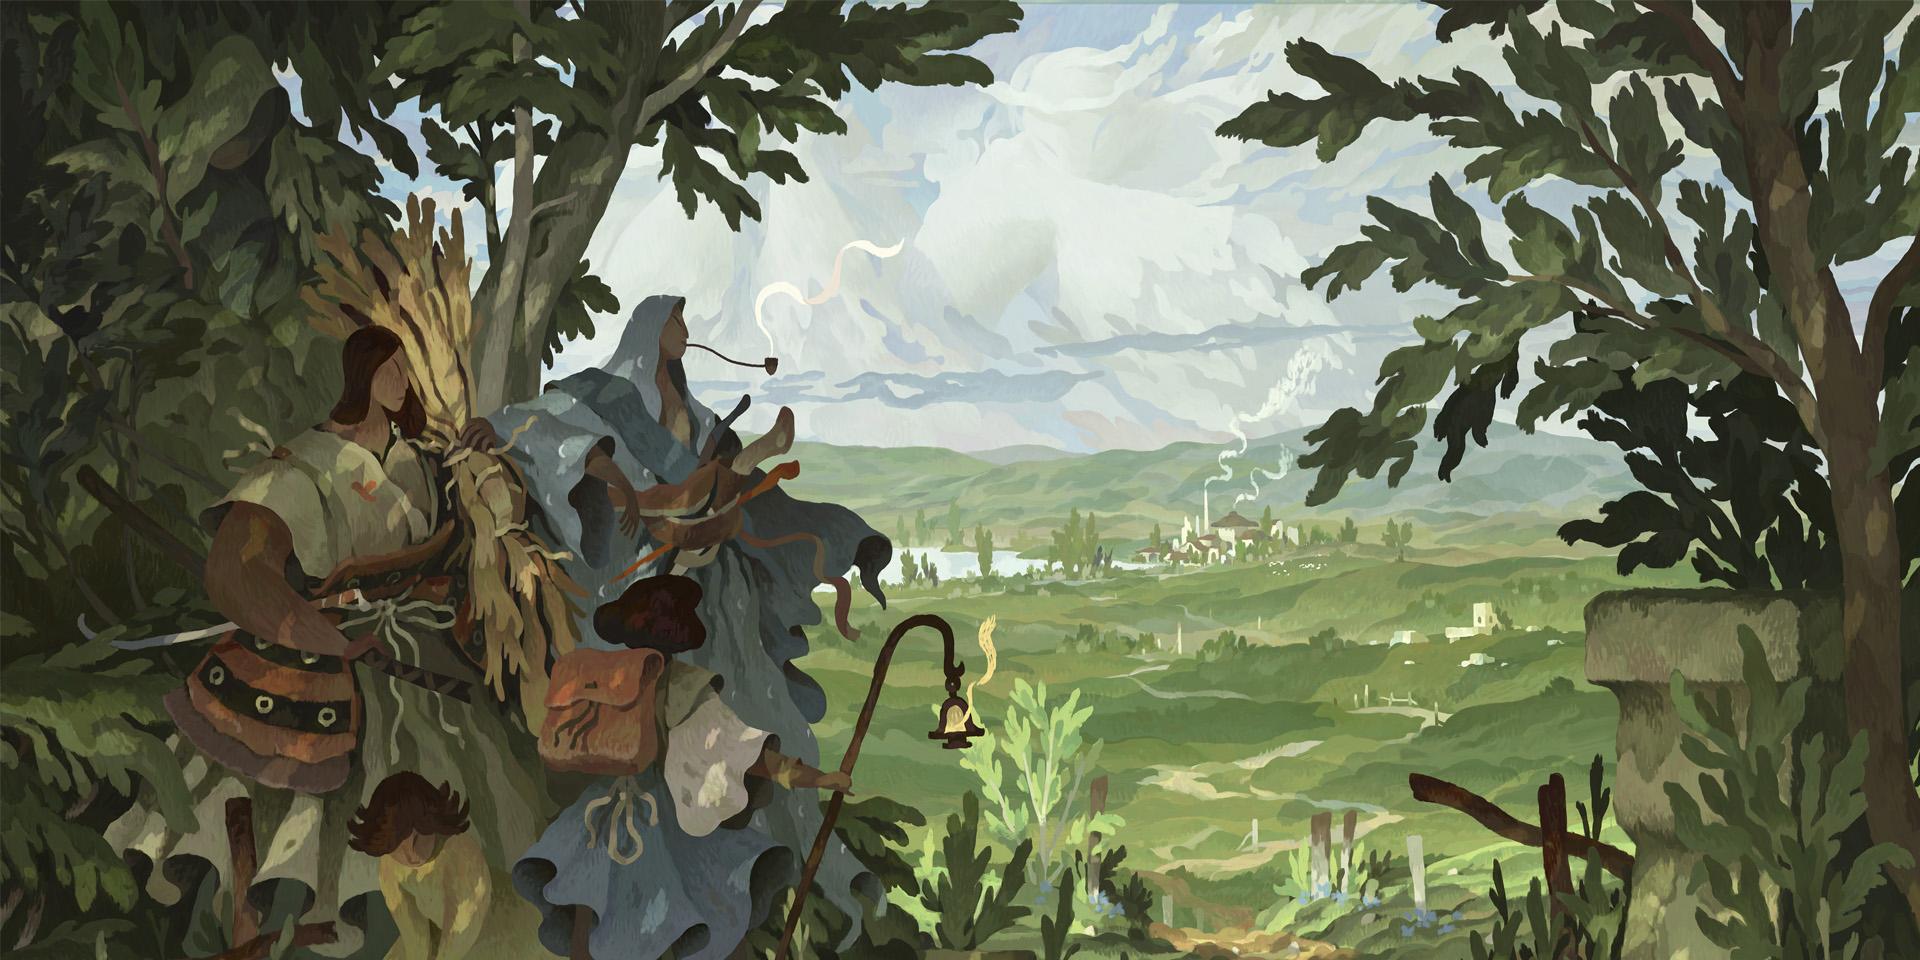 Book of Travels: Полчаса геймплея с авторскими комментариями